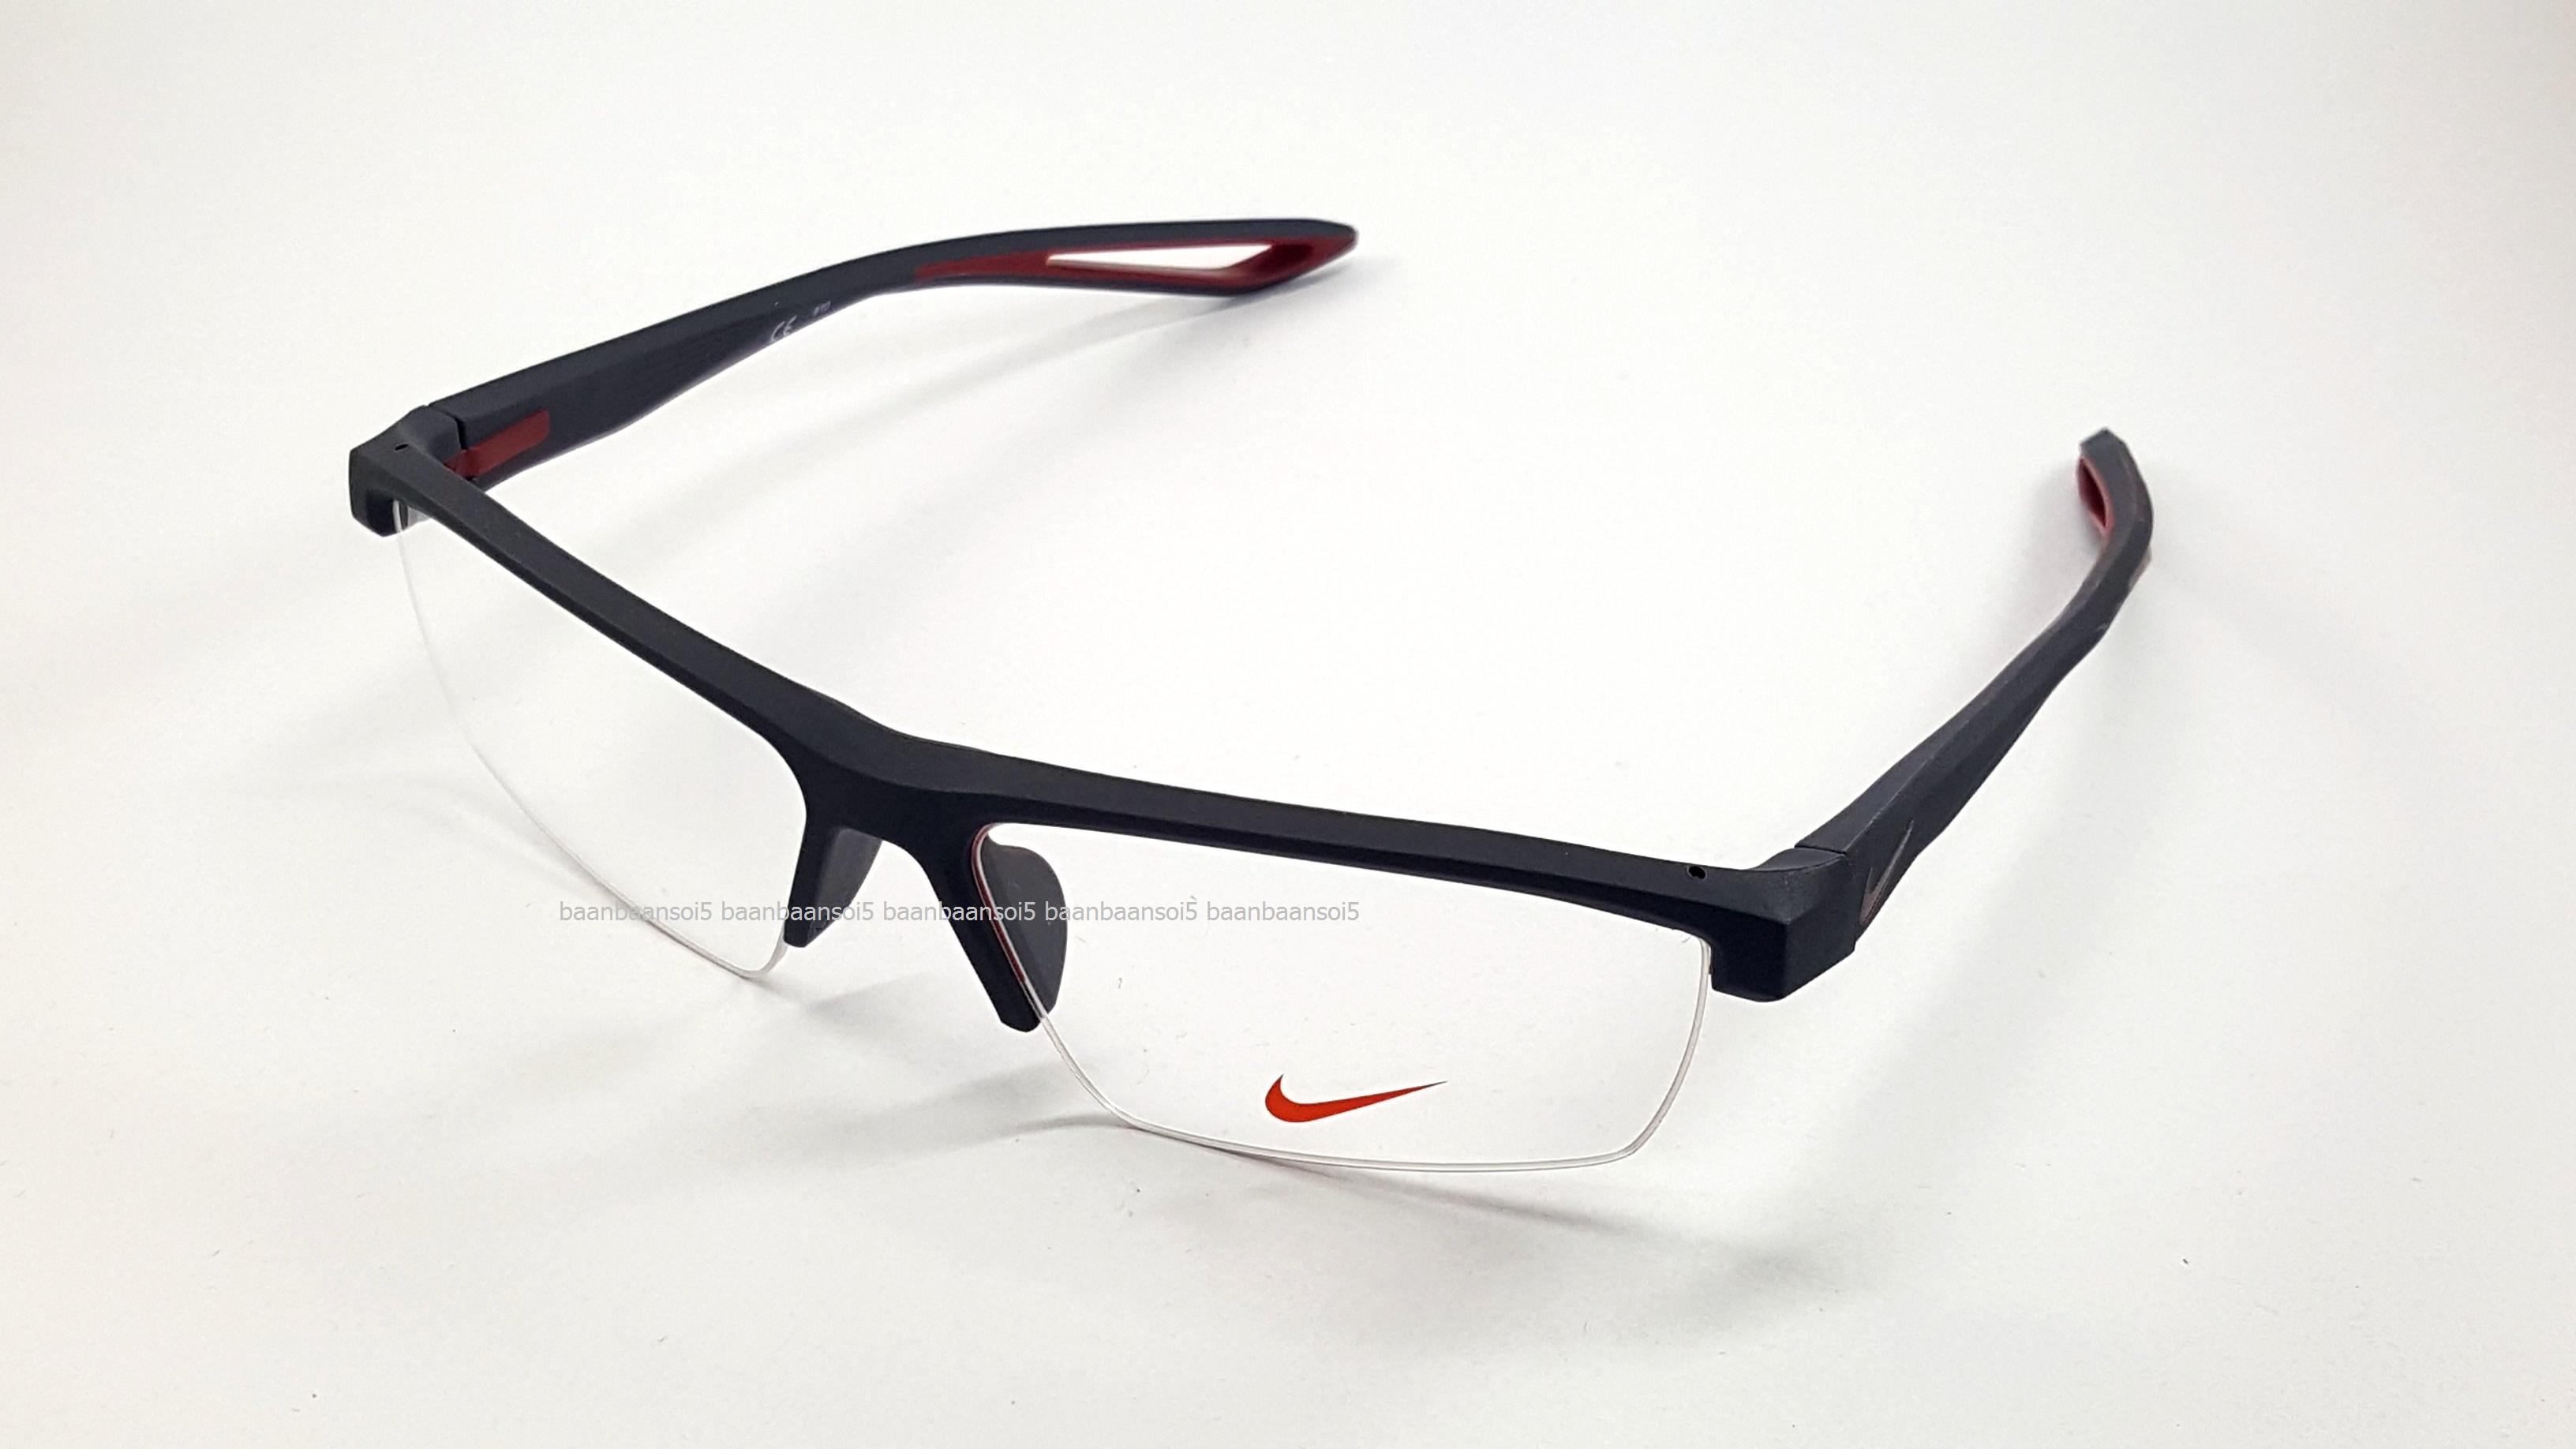 NIKE BRAND ORIGINALแท้ Flexon 7079 020 กรอบแว่นตาพร้อมเลนส์ มัลติโค๊ตHOYA  ป้องกัน f827c3cc0710e